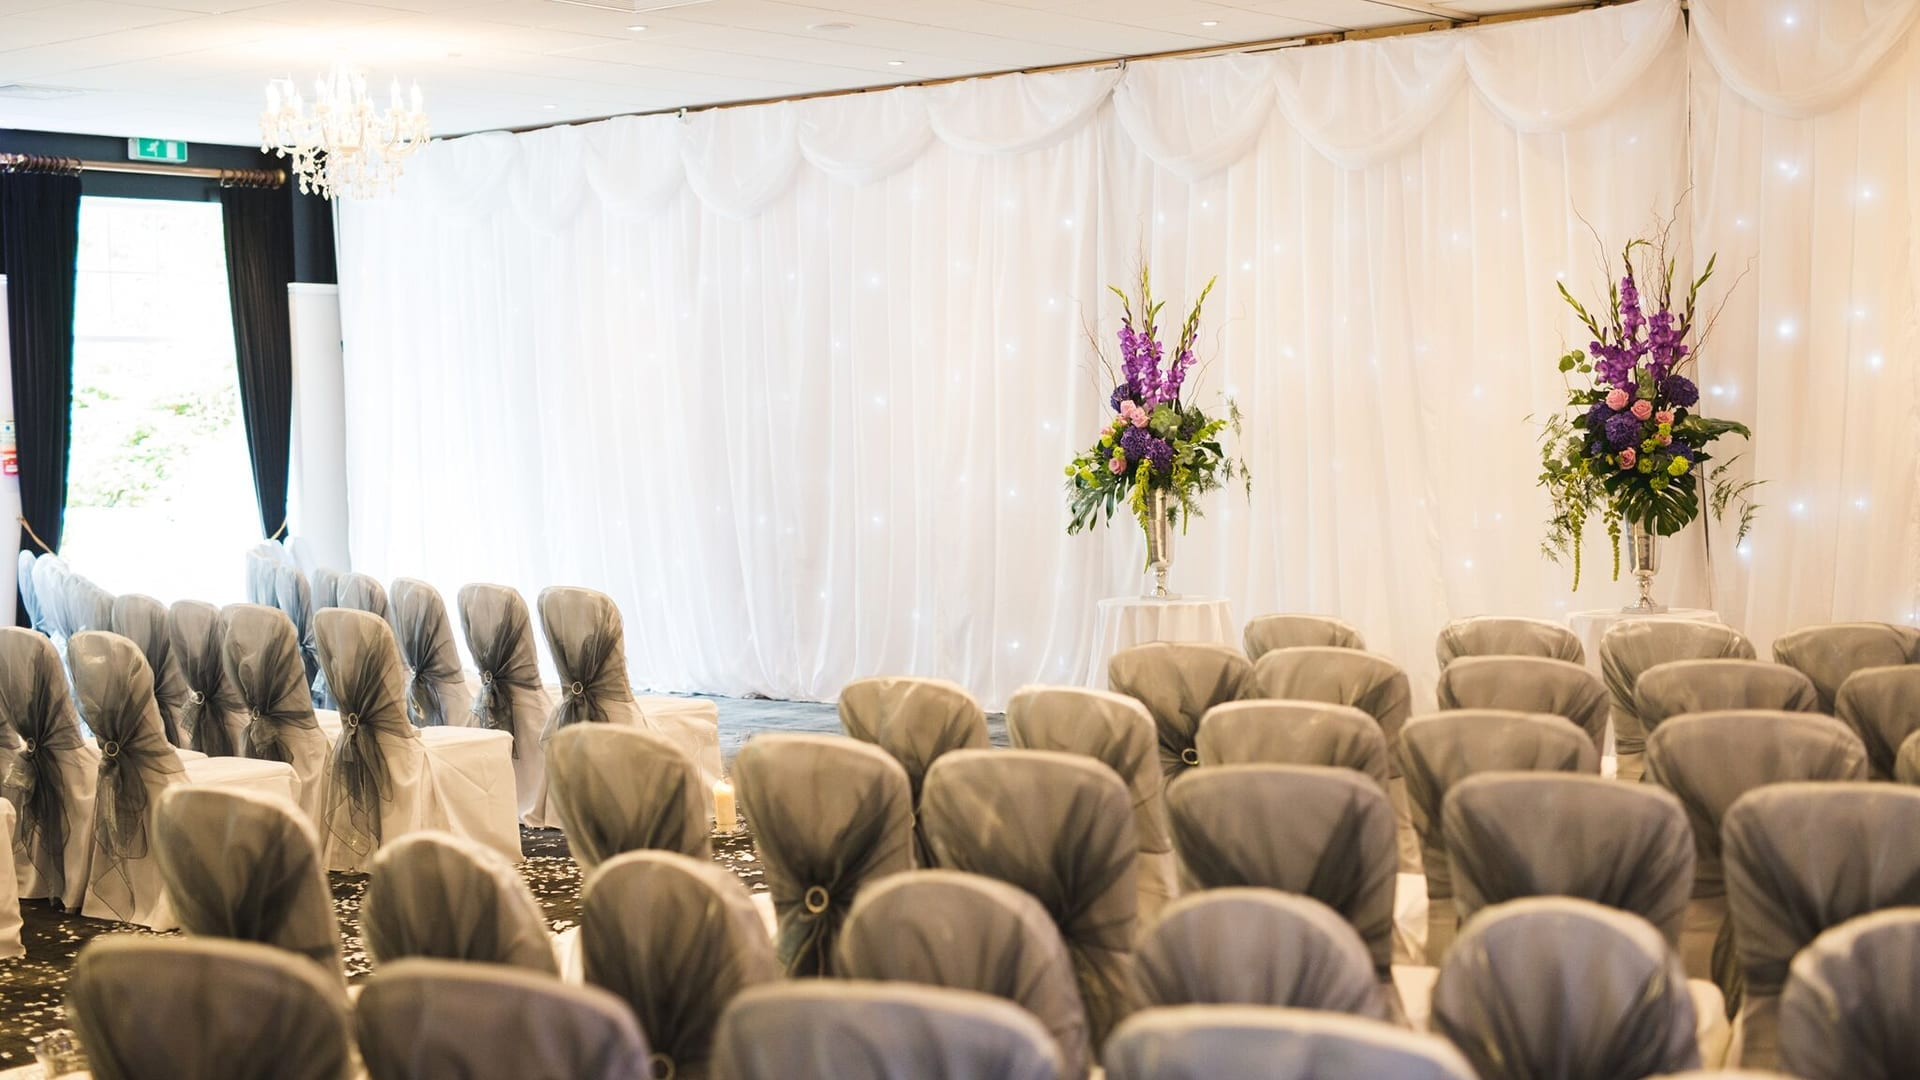 Wedding ceremony layout at Barony Castle